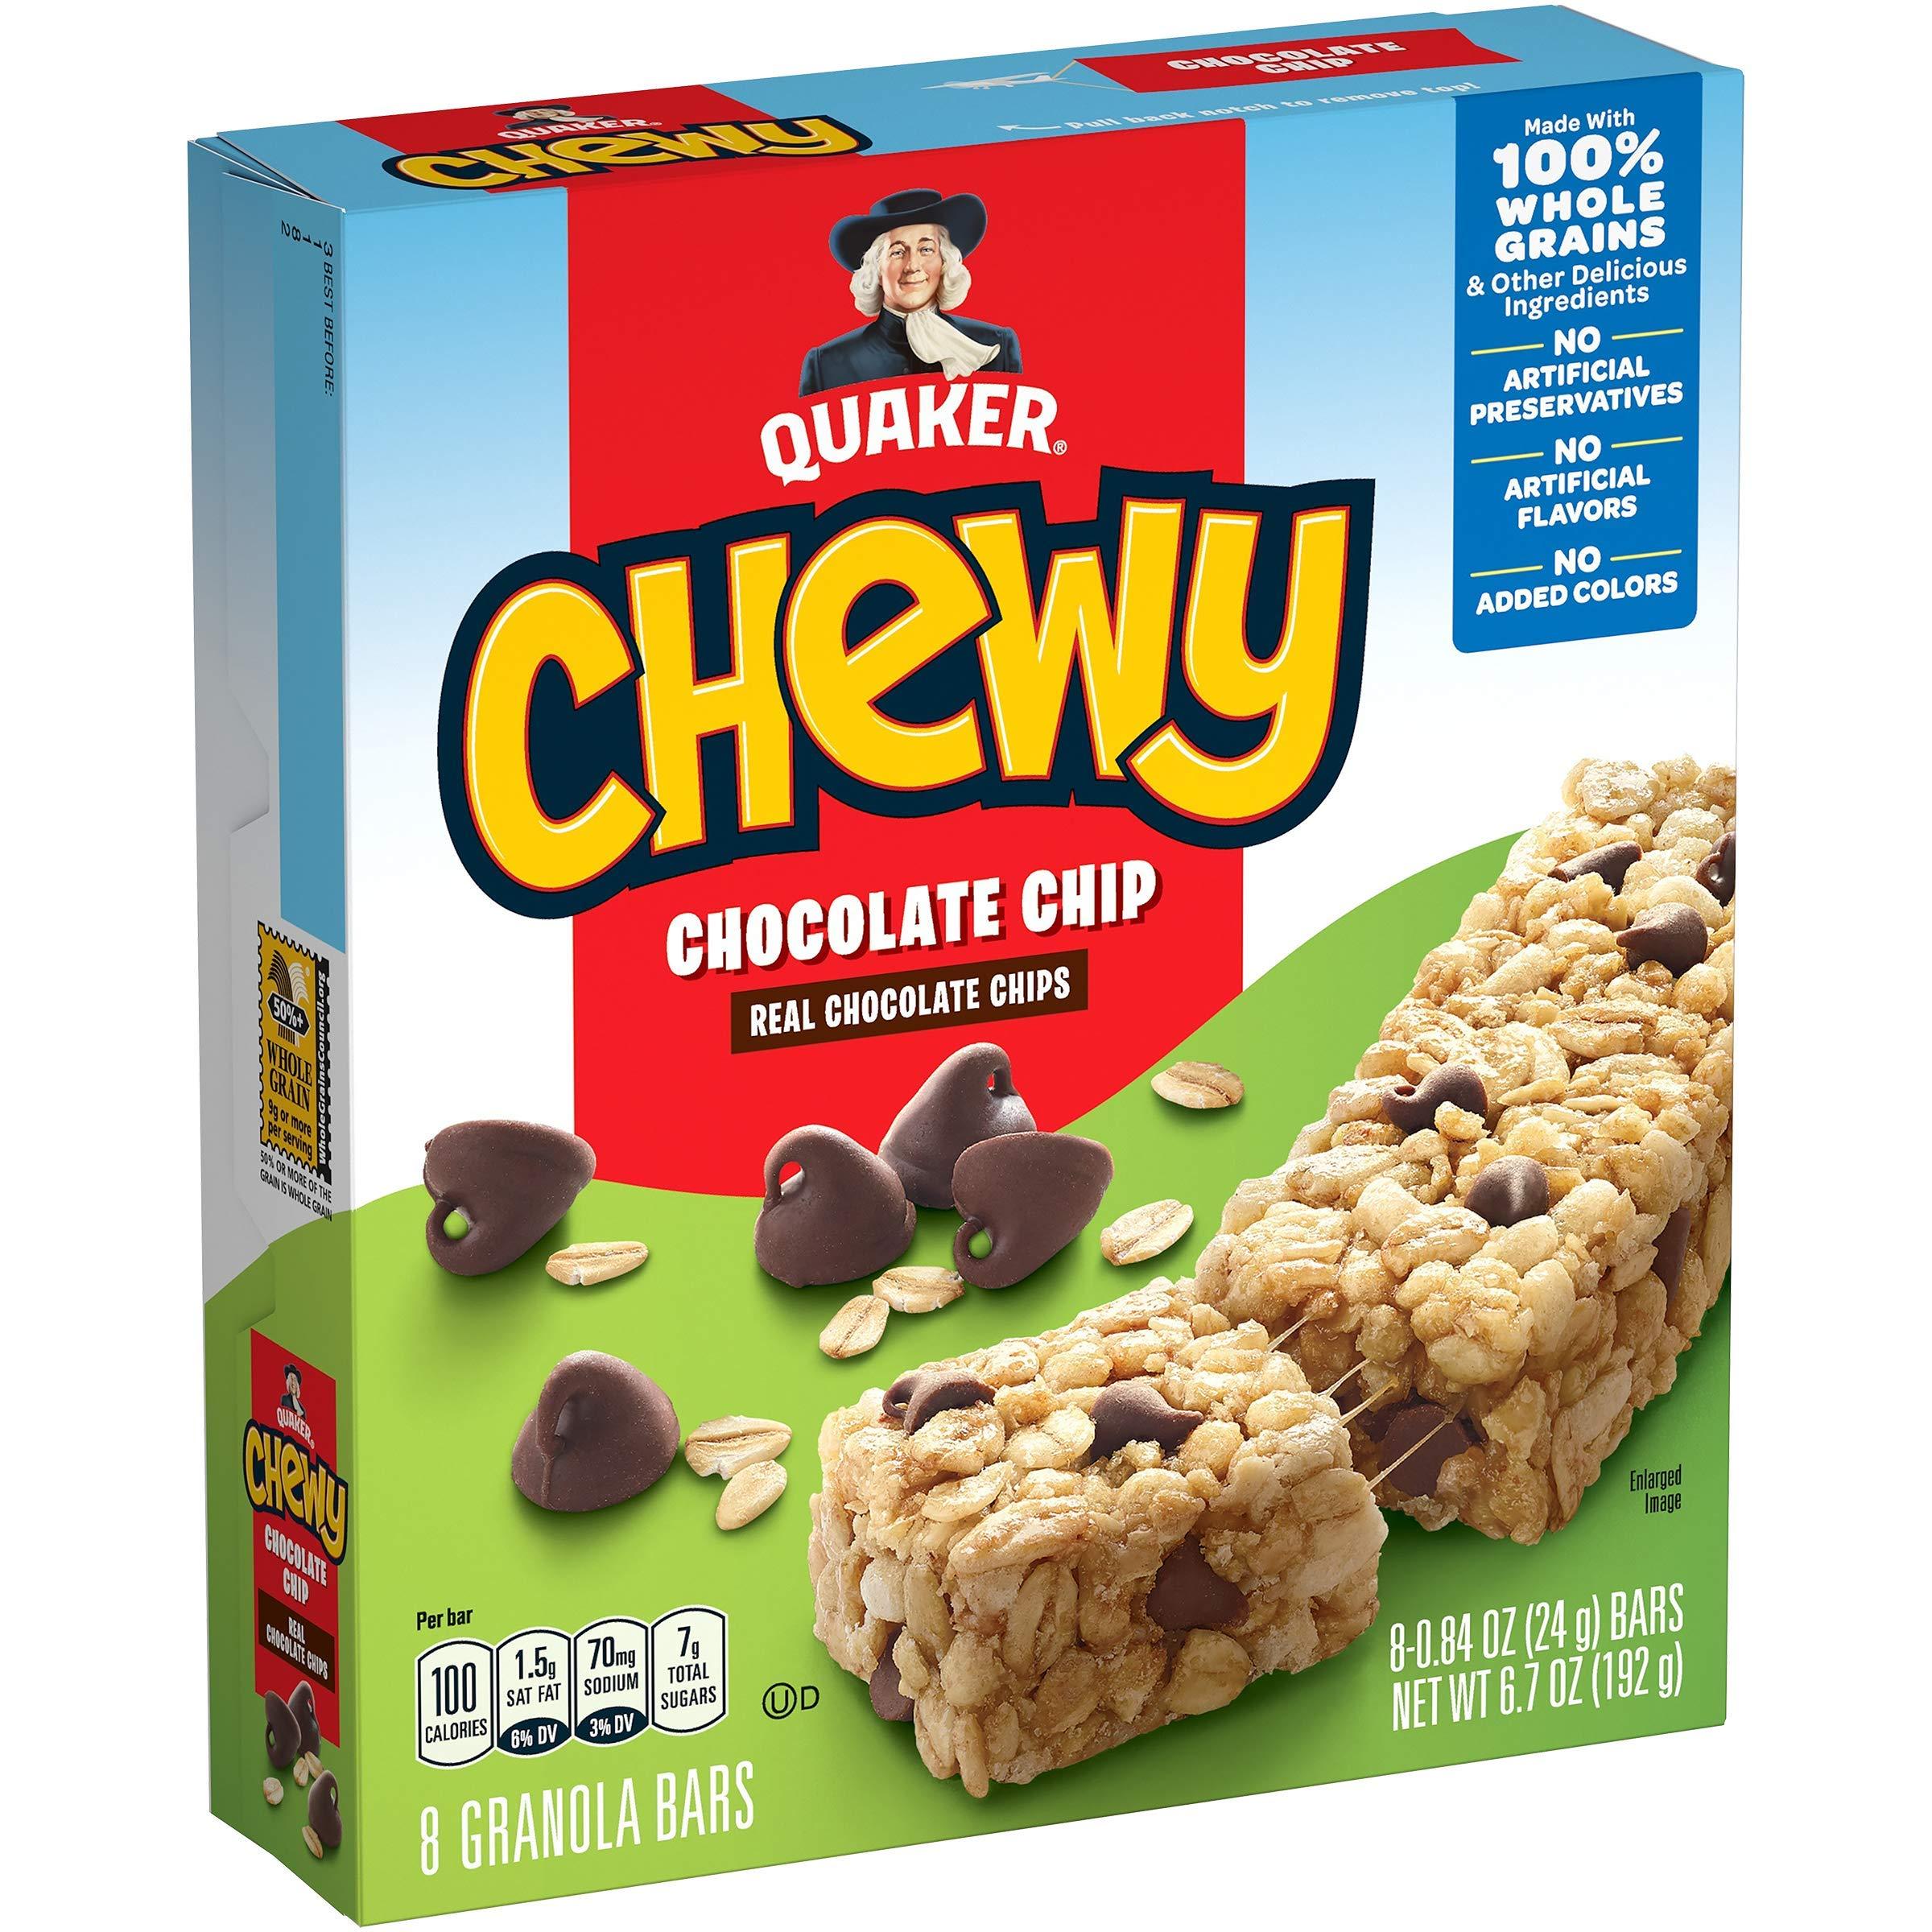 Quaker Chewy Granola Bar Chocolate Chip Granola Bars, .84oz bars 8 count, 6.72oz